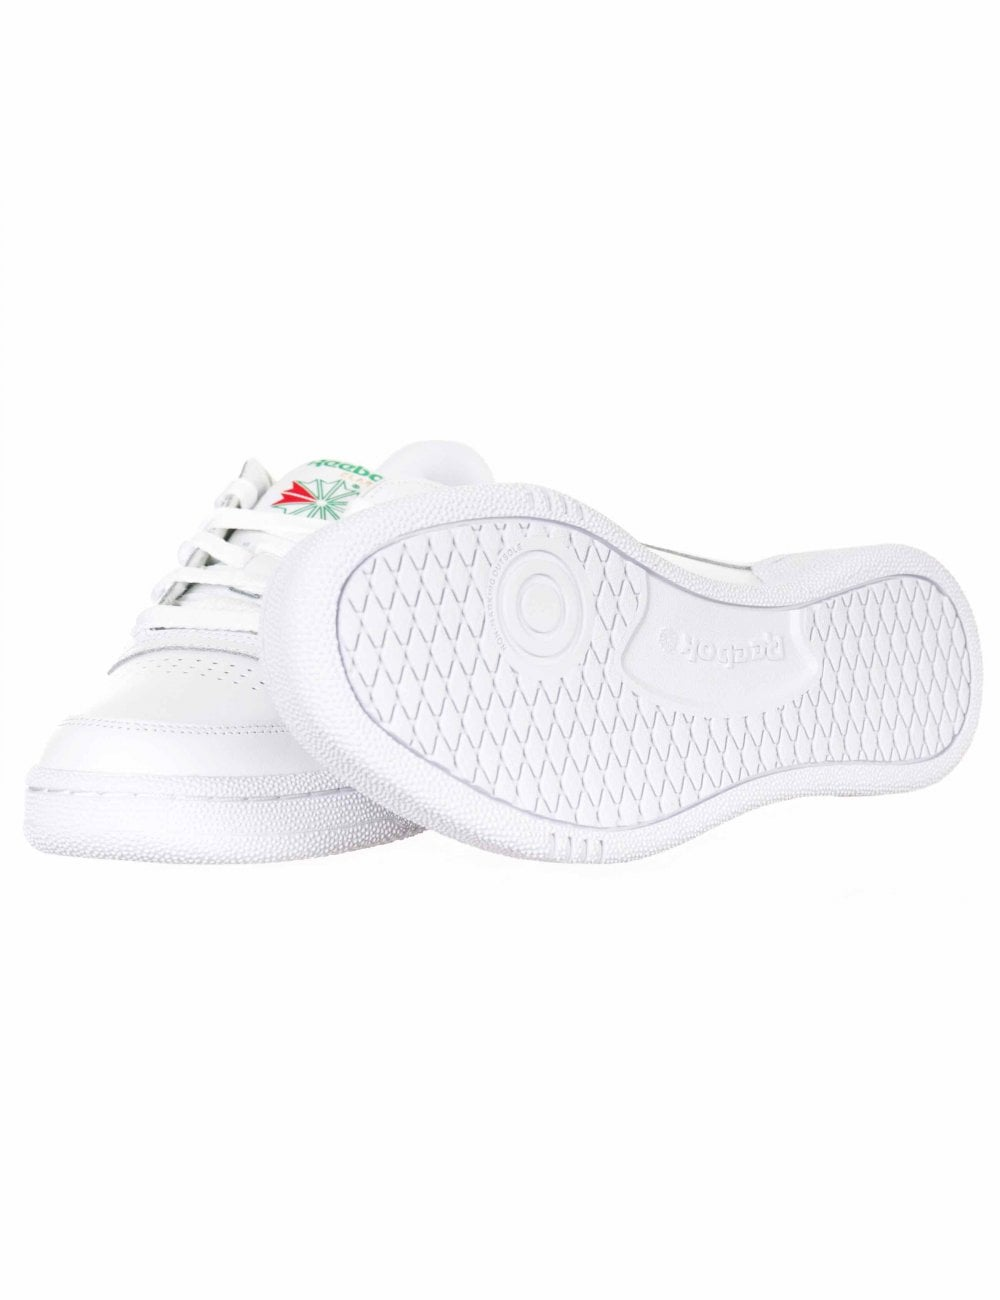 c3a656184c5 Reebok Club C 85 Trainers - White Green - Footwear from Fat Buddha ...